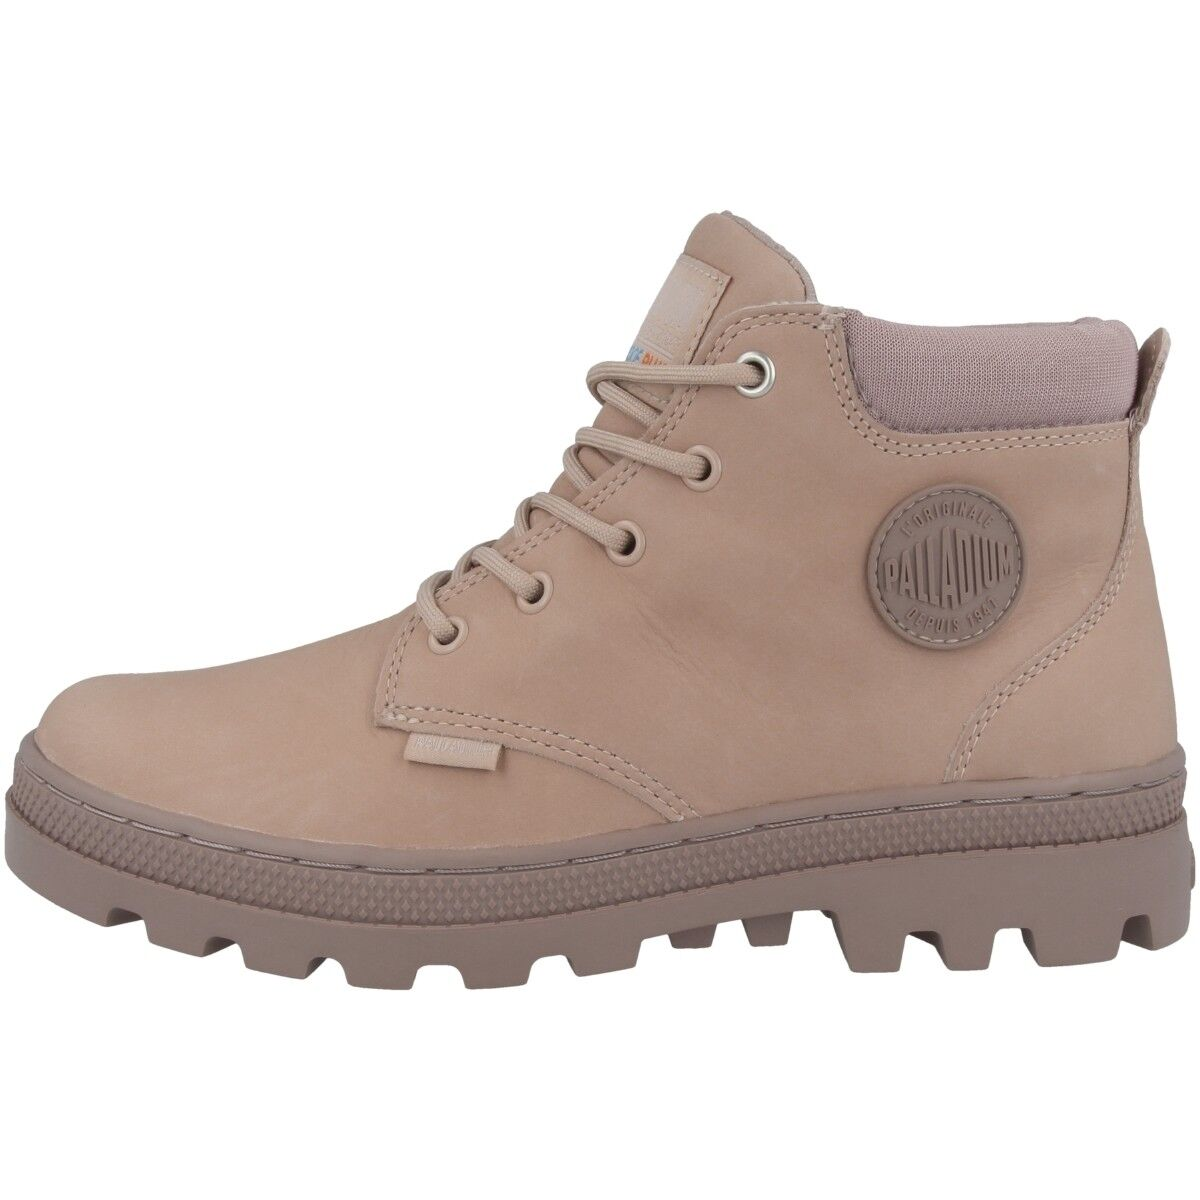 Palladium Pallabosse lo Cuff L Zapatos Alto Top mujer mujer mujer Deportiva Bota 95944-671 85f4f3